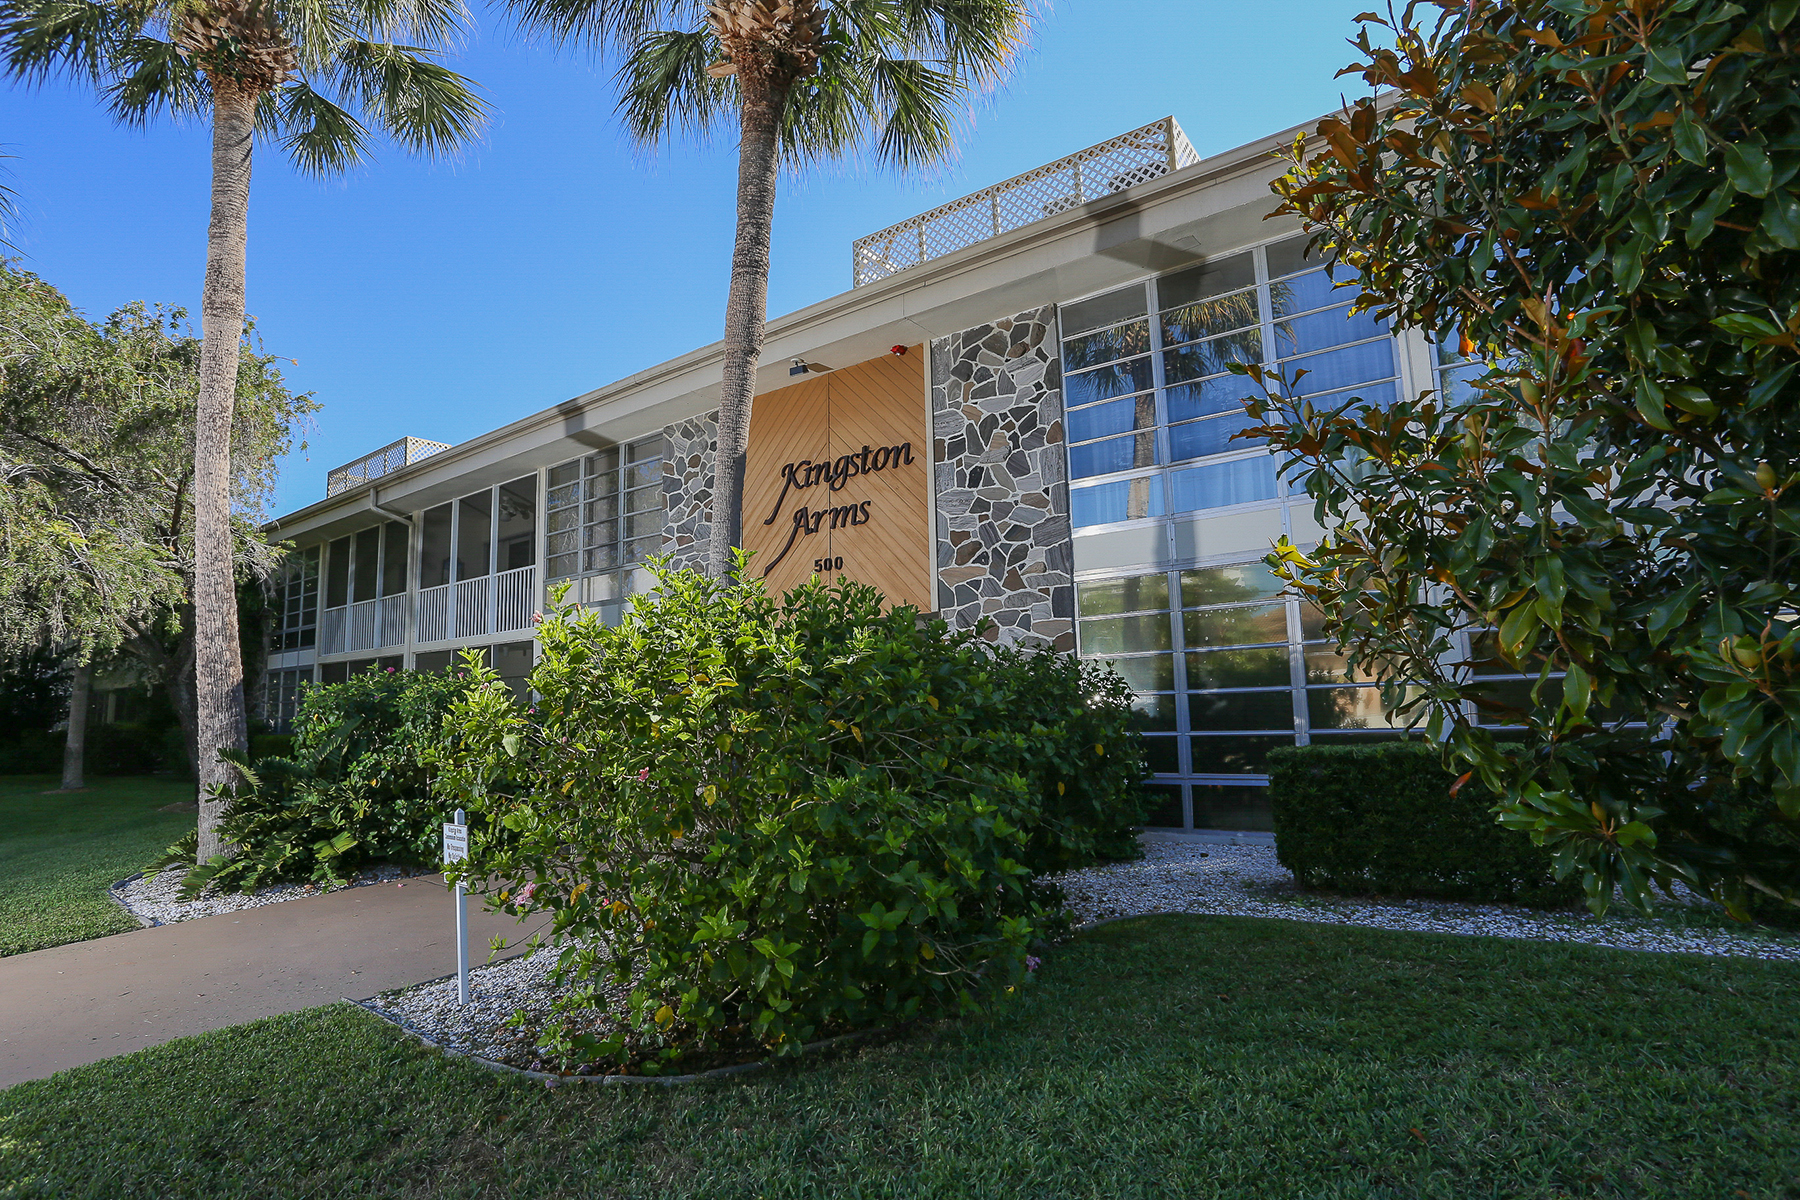 شقة بعمارة للـ Rent في SARASOTA - KINGSTON ARMS 500 S Washington Dr 5A, Sarasota, Florida, 34236 United States